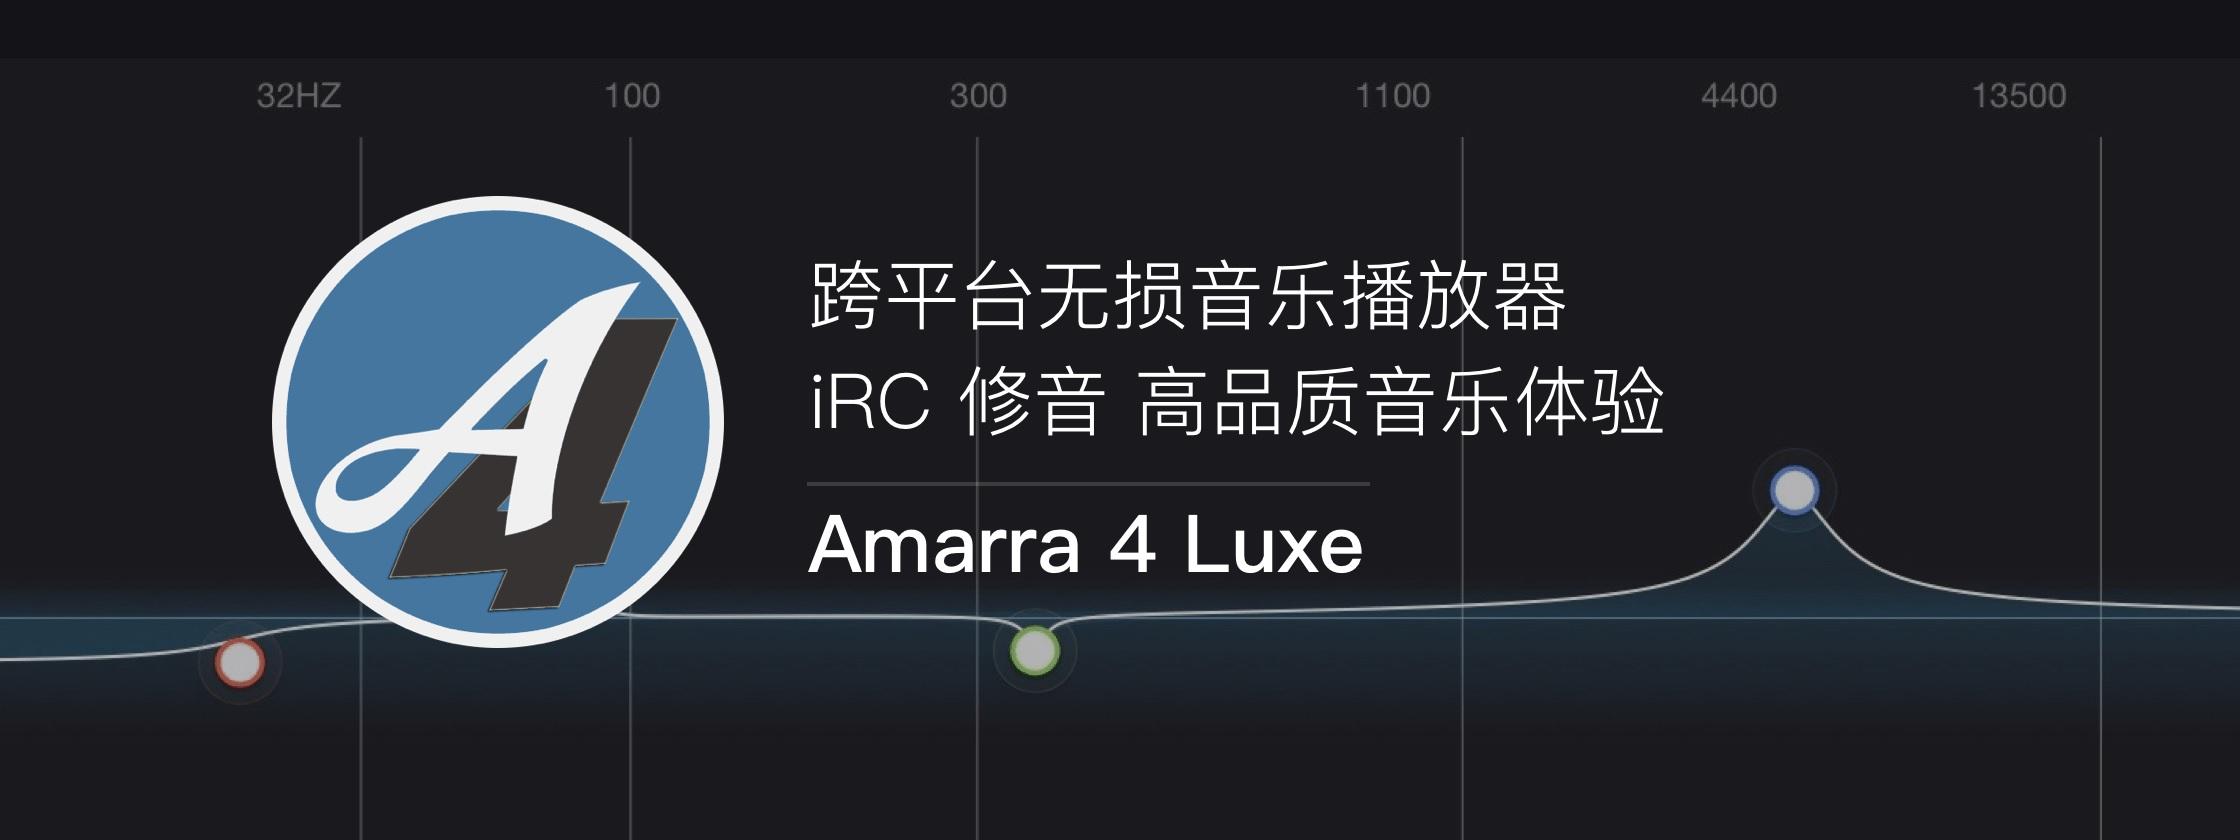 Amarra Luxe破解版|Amarra Luxe(音乐播放软件)for mac 4 破解版 免激活码